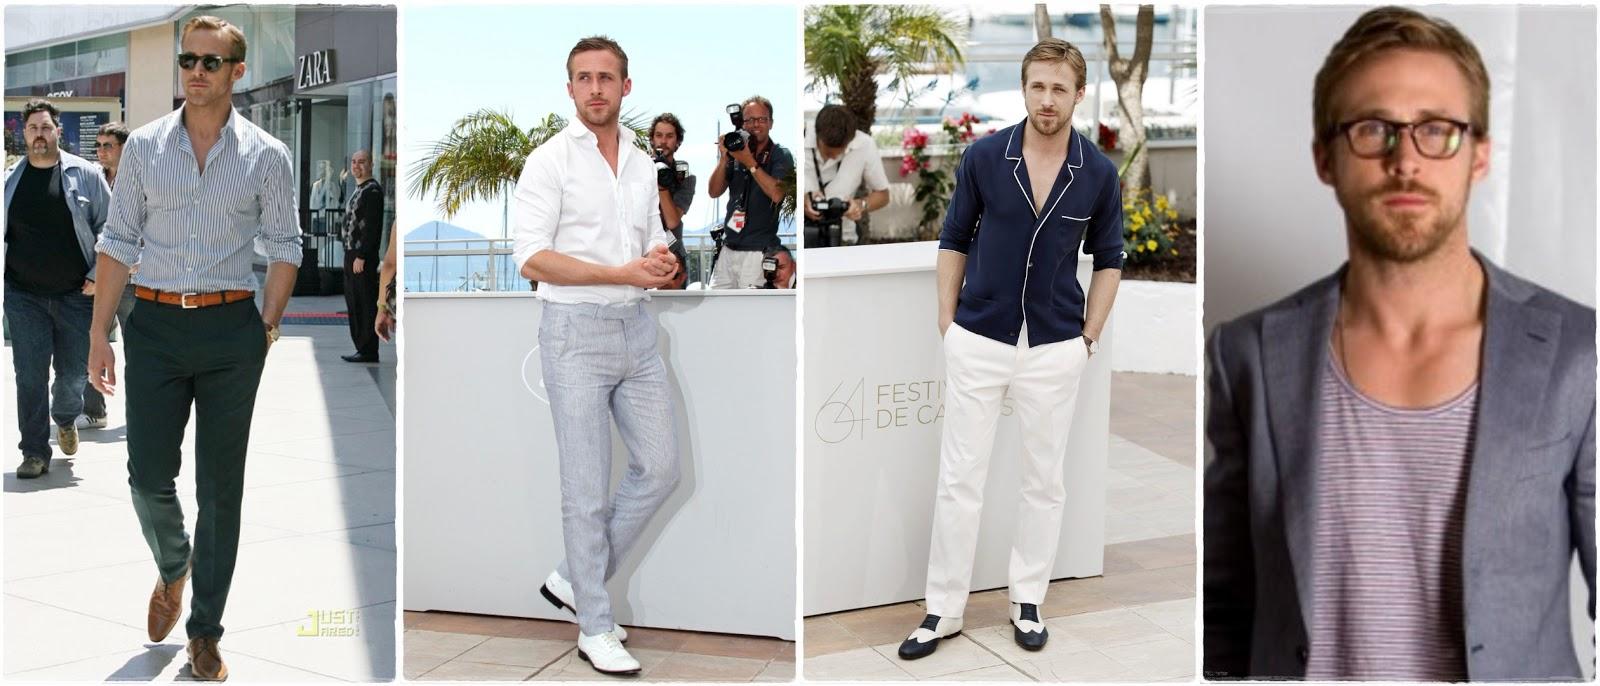 Ryan Gosling - Cannes, Ferragamo and Crazy, Stupid, Love